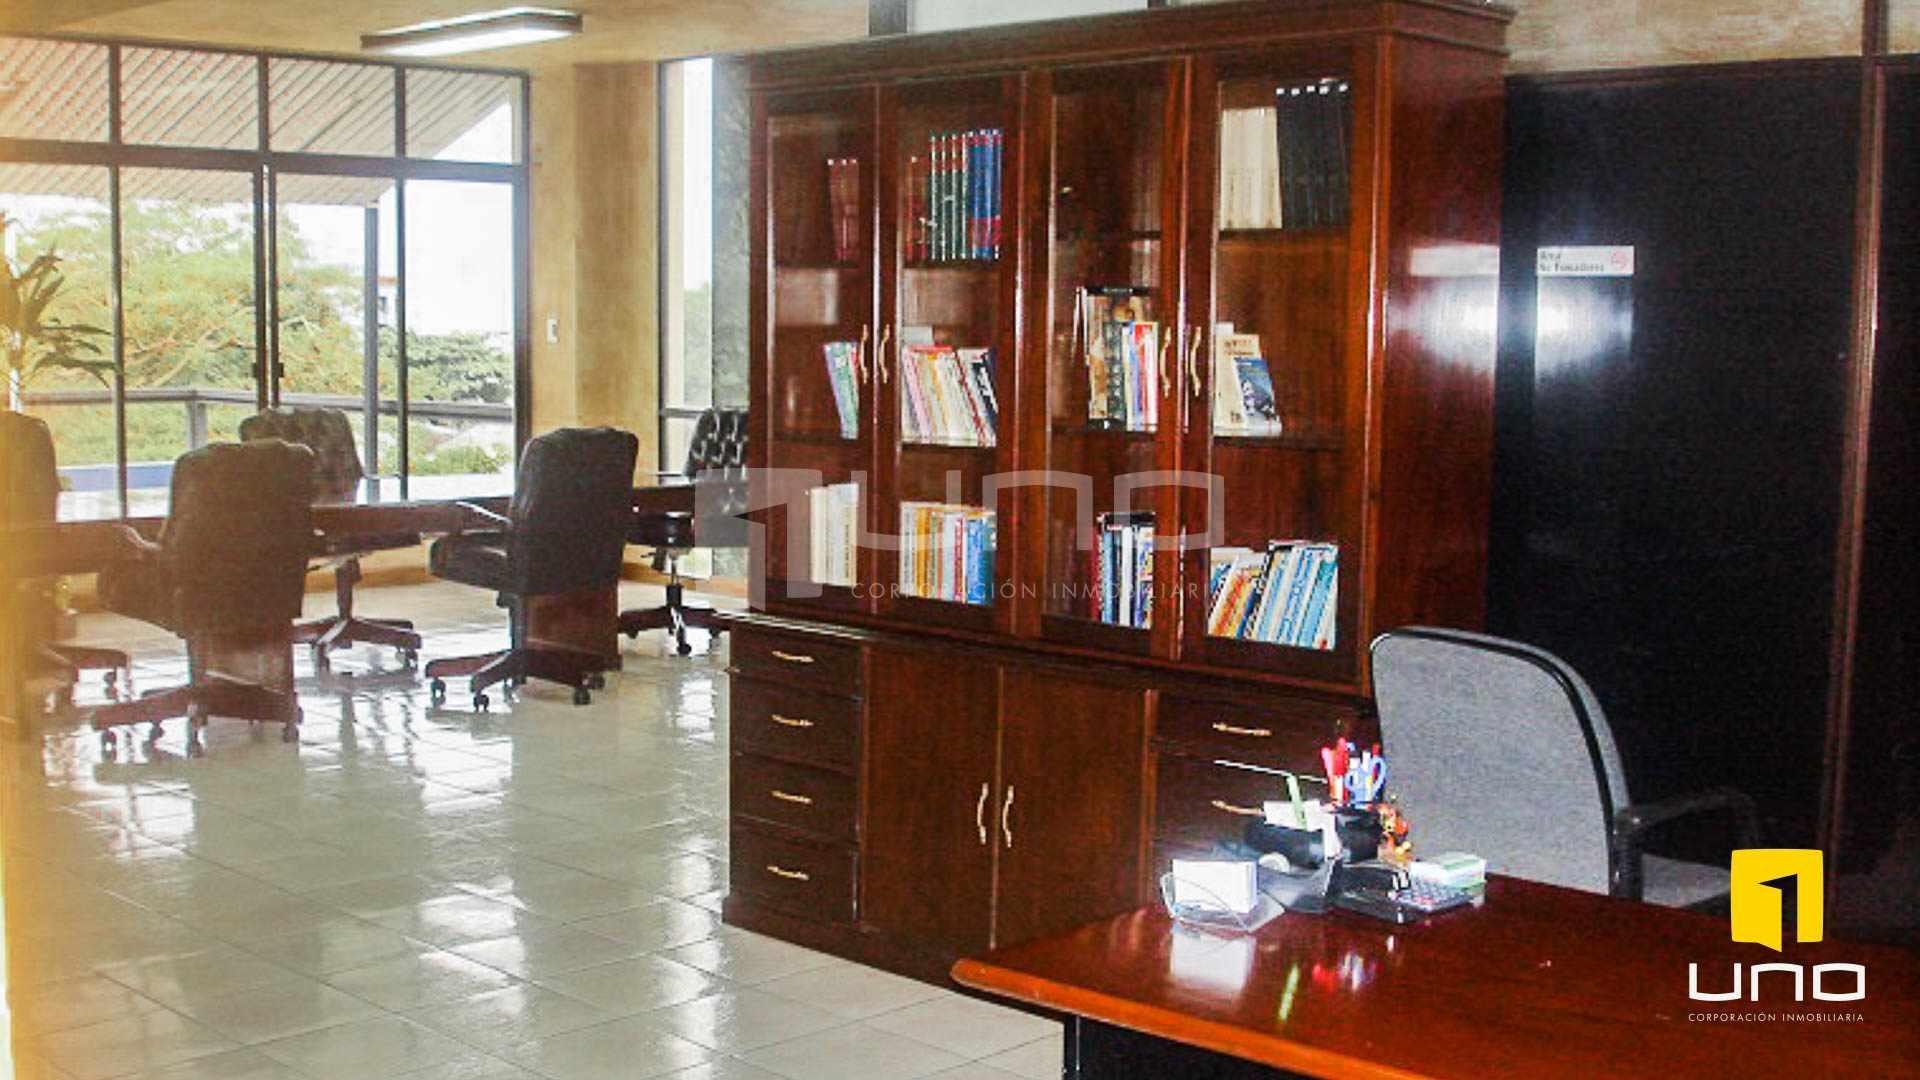 Oficina en Venta REGALO OFICINA SOBRE AV. IRALA EN PRIMER PISO Foto 5